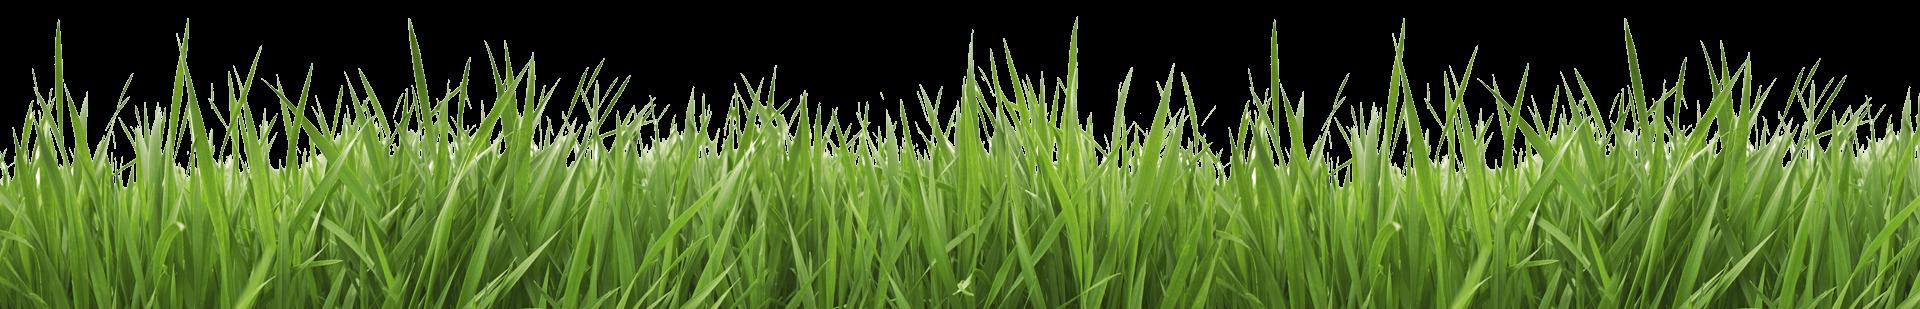 Lawn Care Clipart Free Download Clip Art.